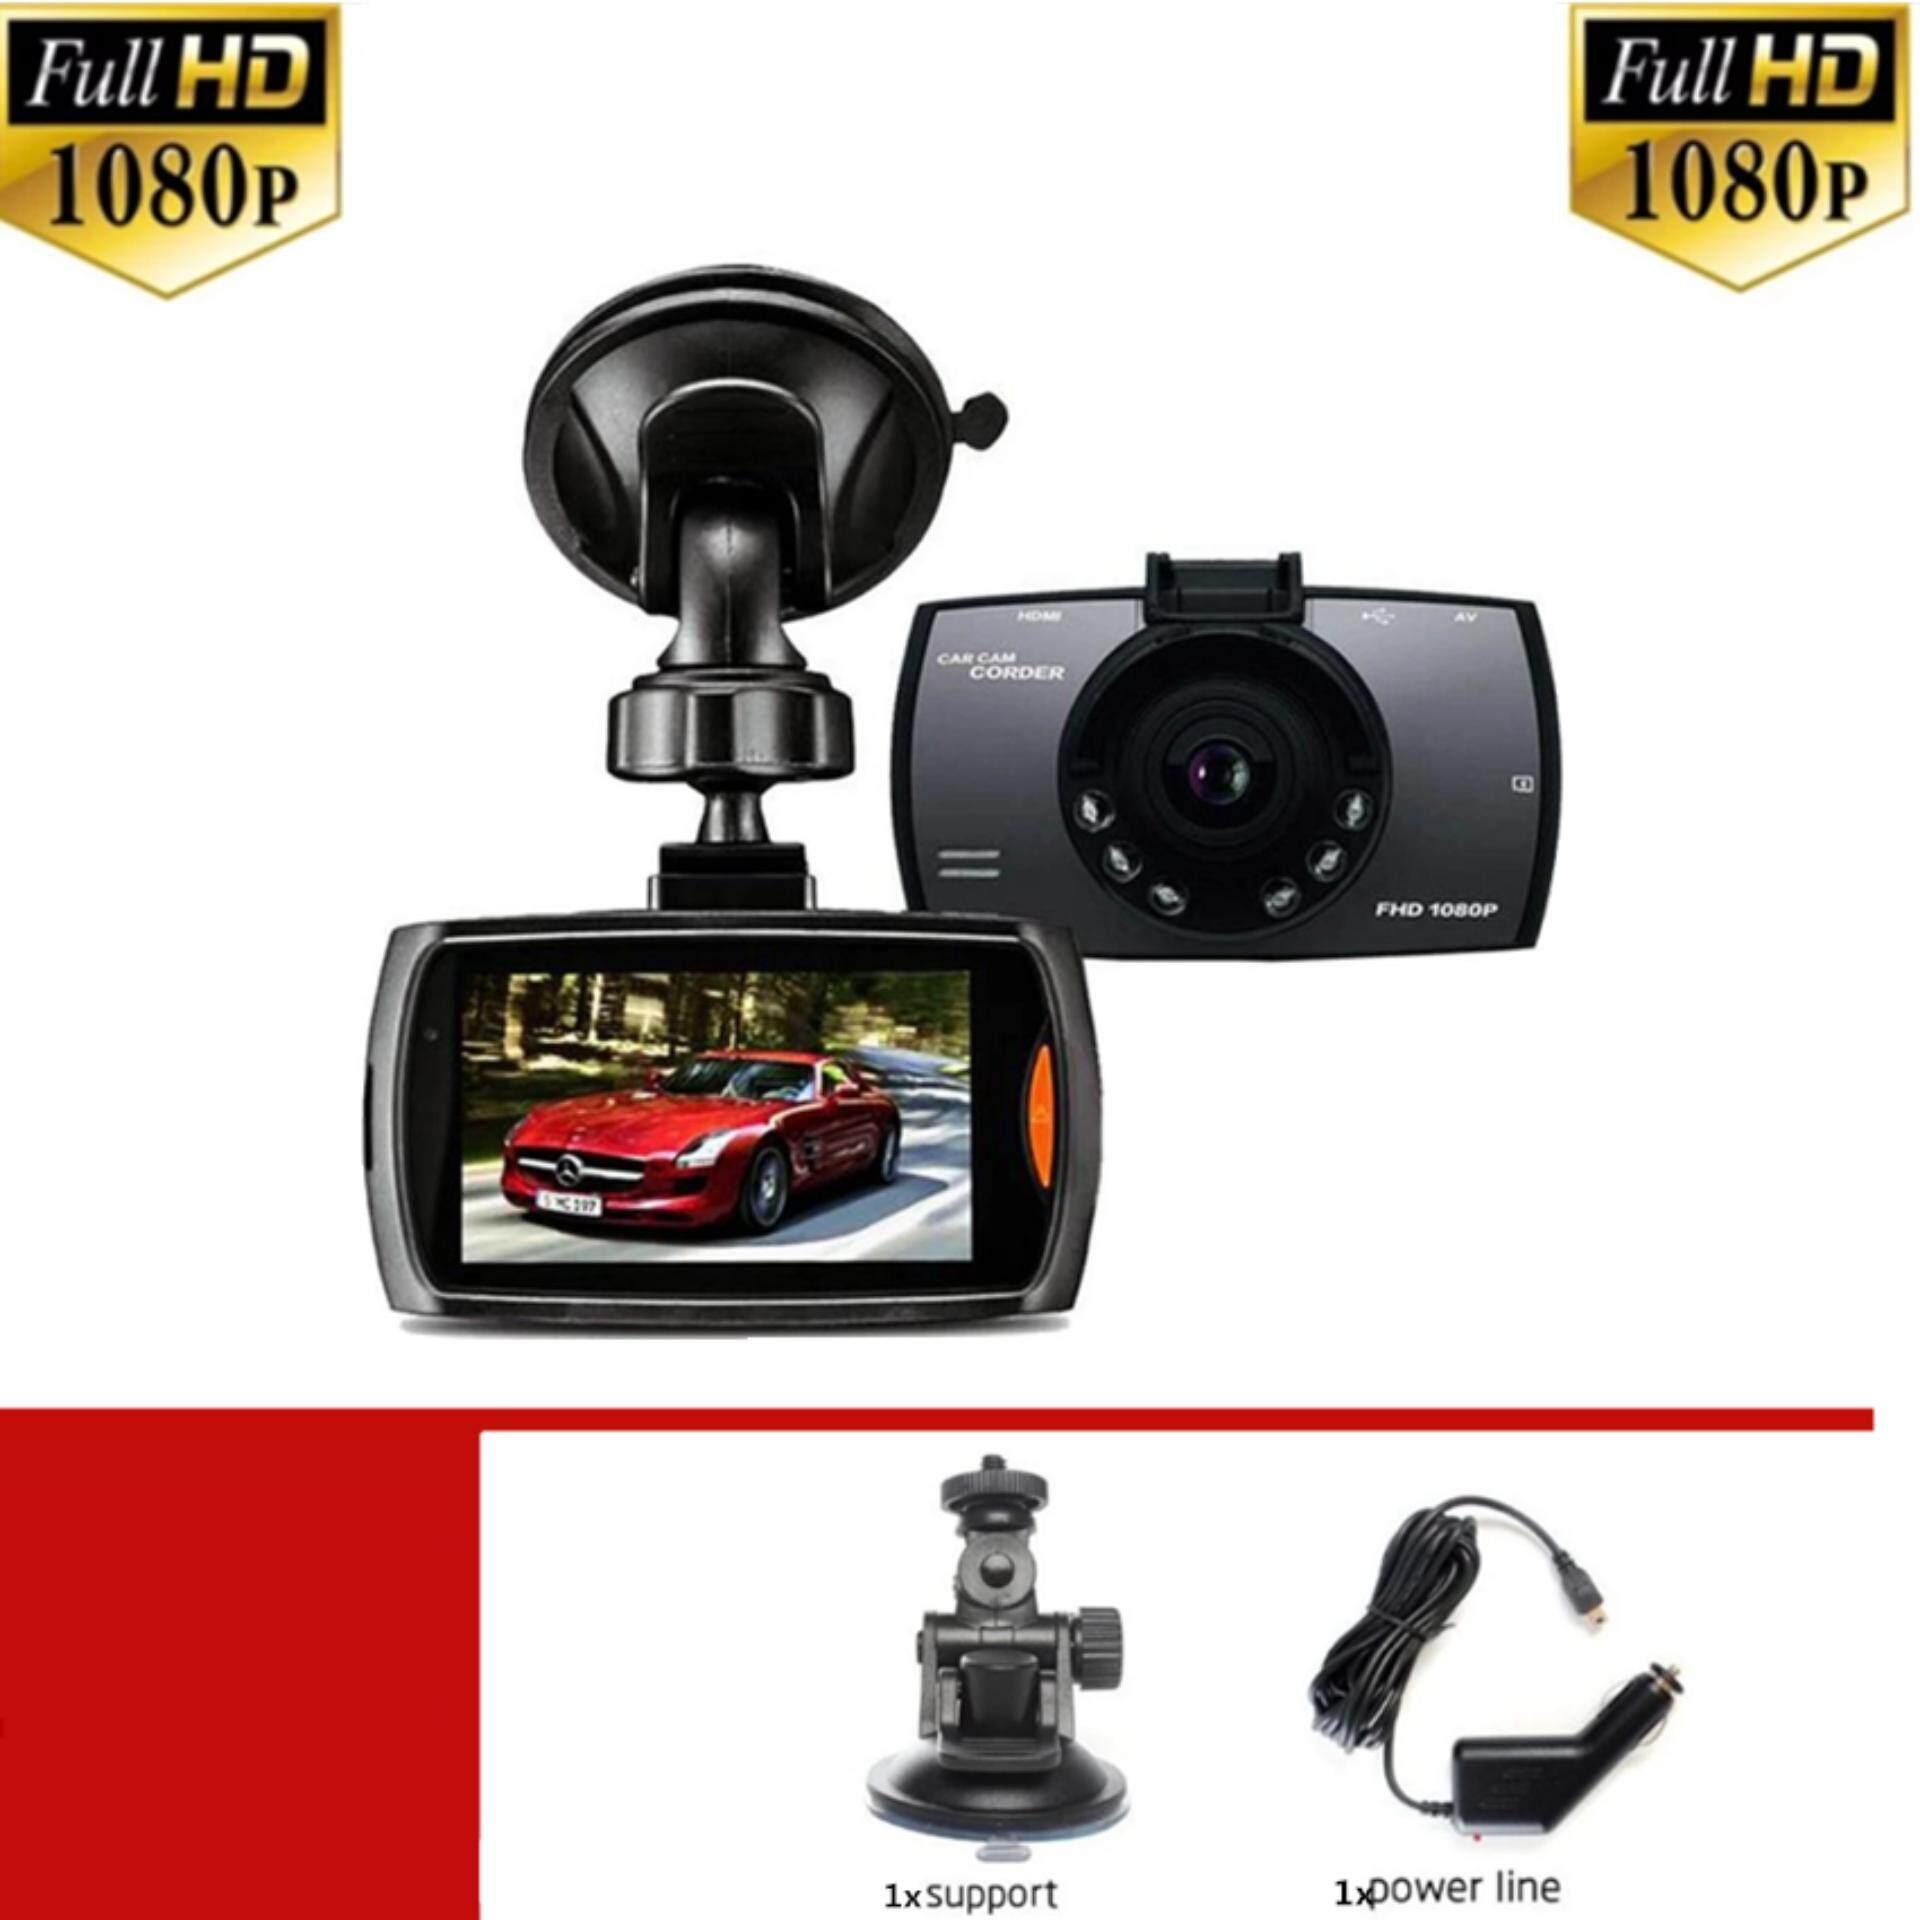 XCSource กล้องติดรถยนต์ G30 รองรับการถ่ายโหมดกลางคืน 170° 1080P(black)1ชิ้น